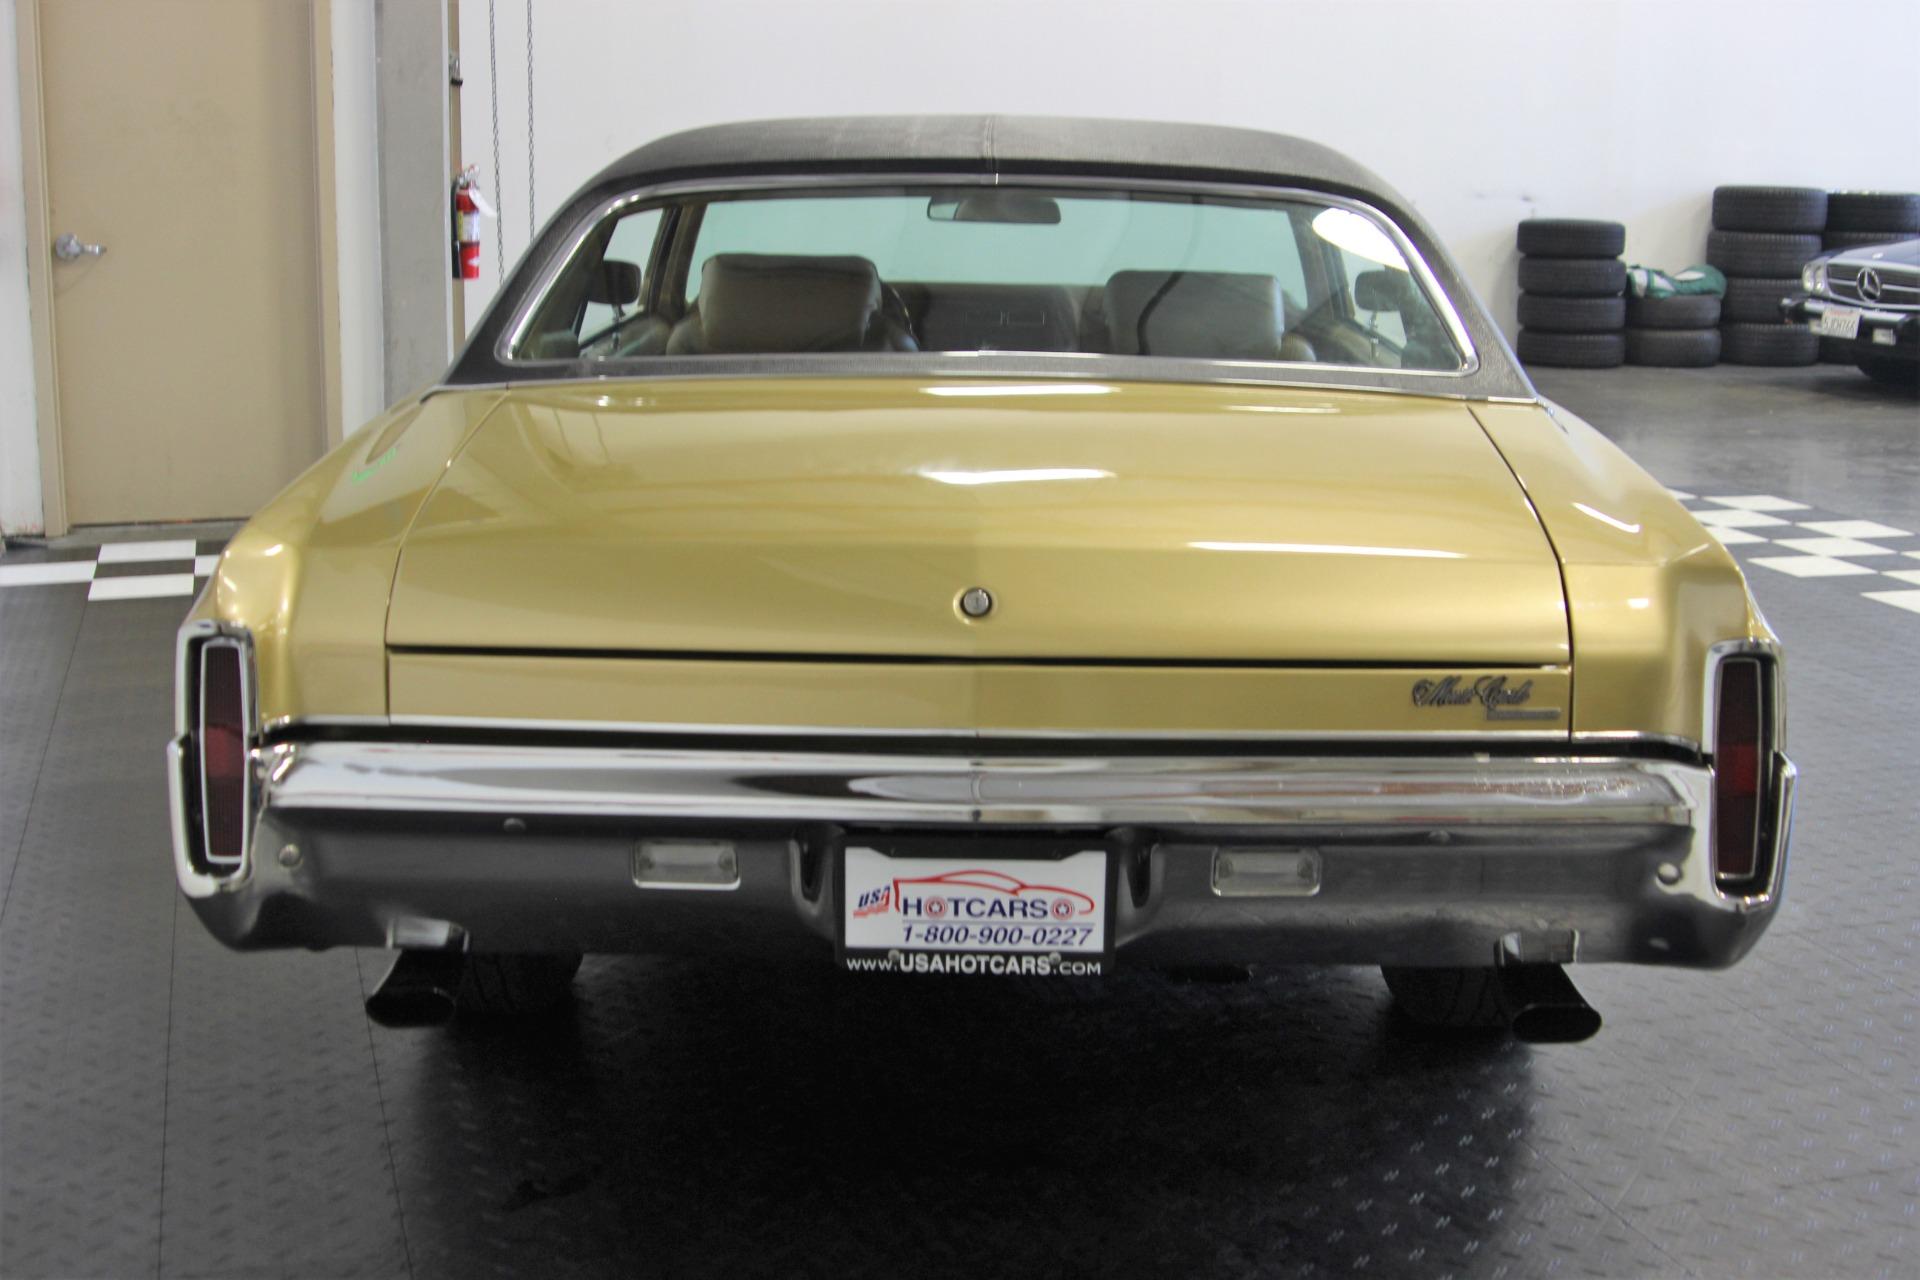 Used-1970-Chevrolet-Monte-Carlo